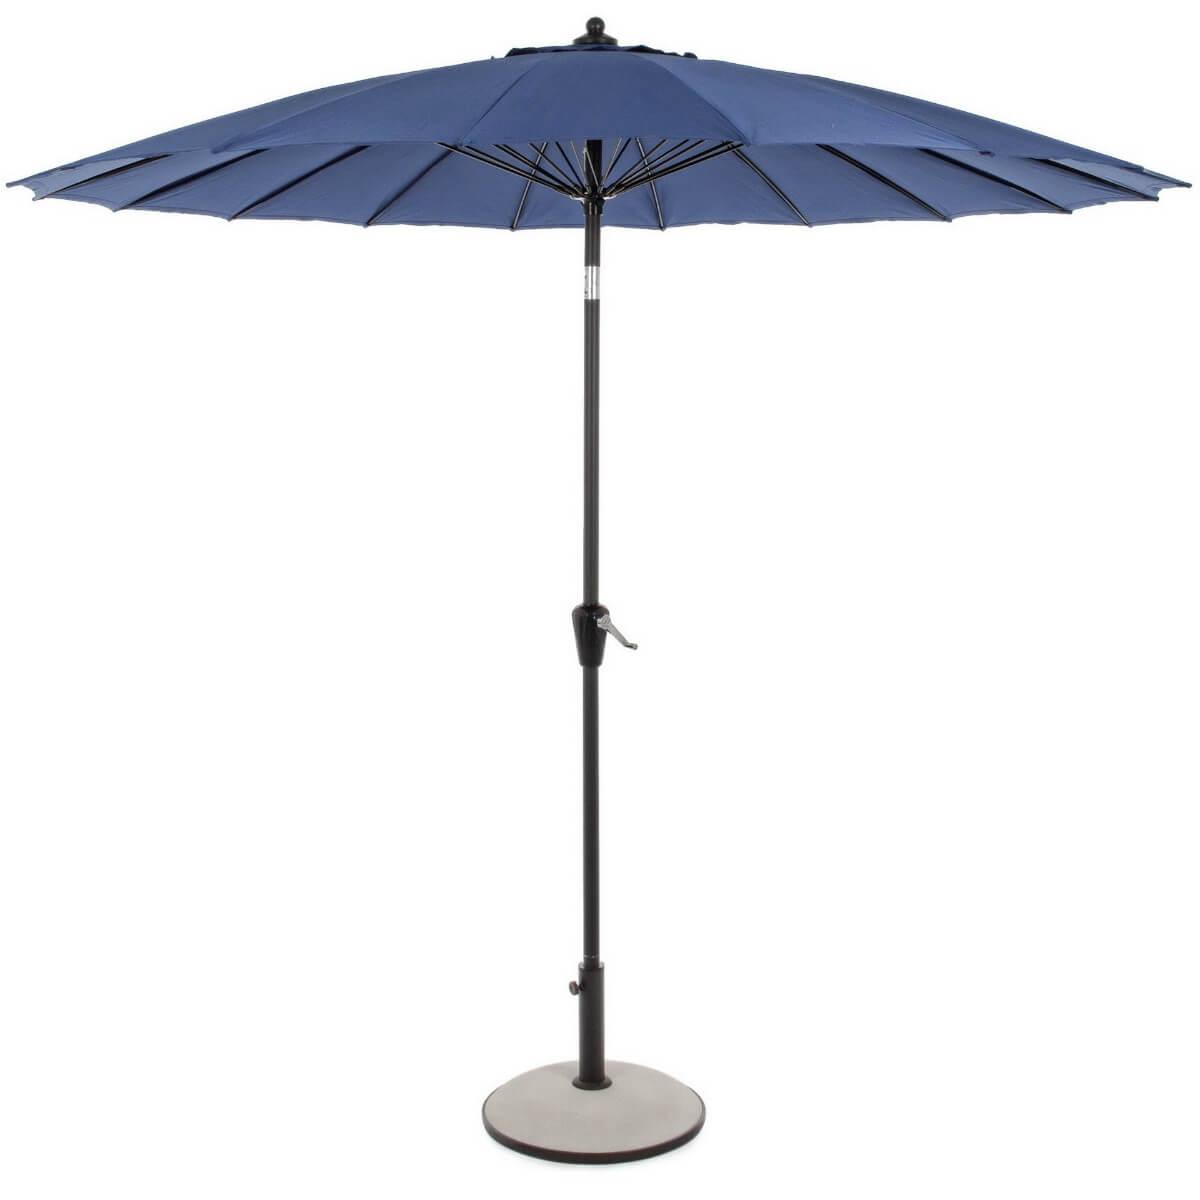 Зонт 4villa Атланта 270 см синий